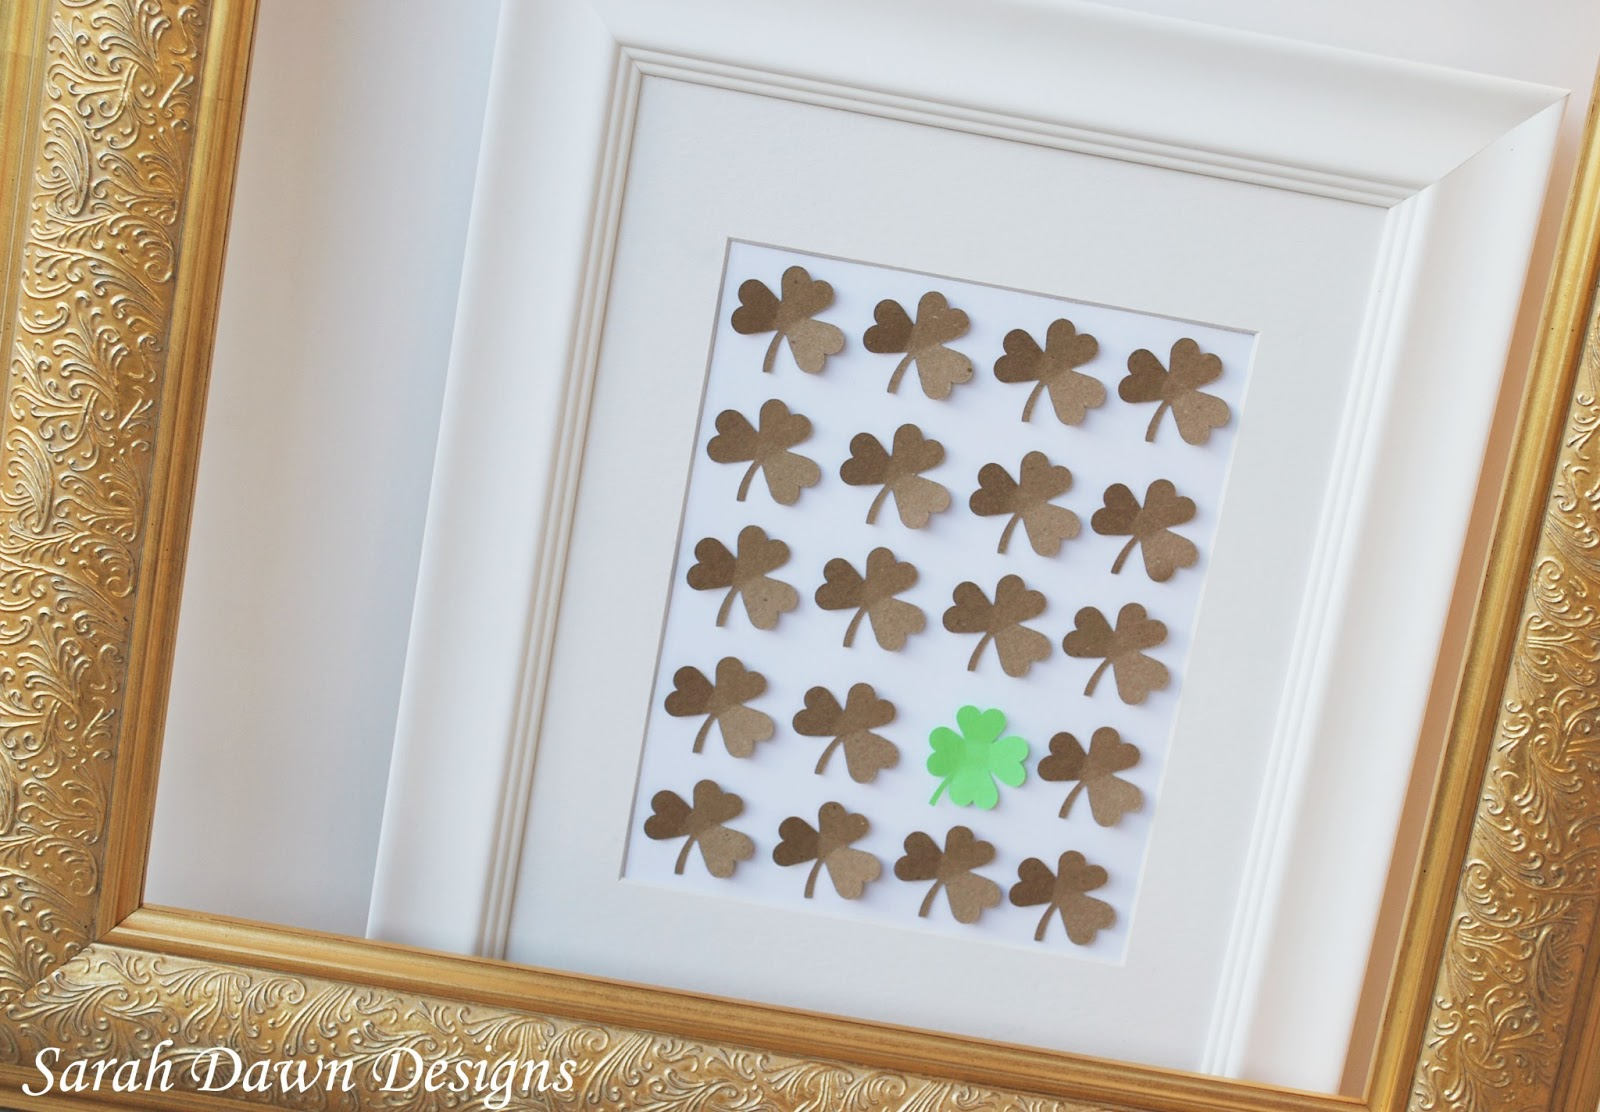 Sarah Dawn Designs St Patrick's Day Craft